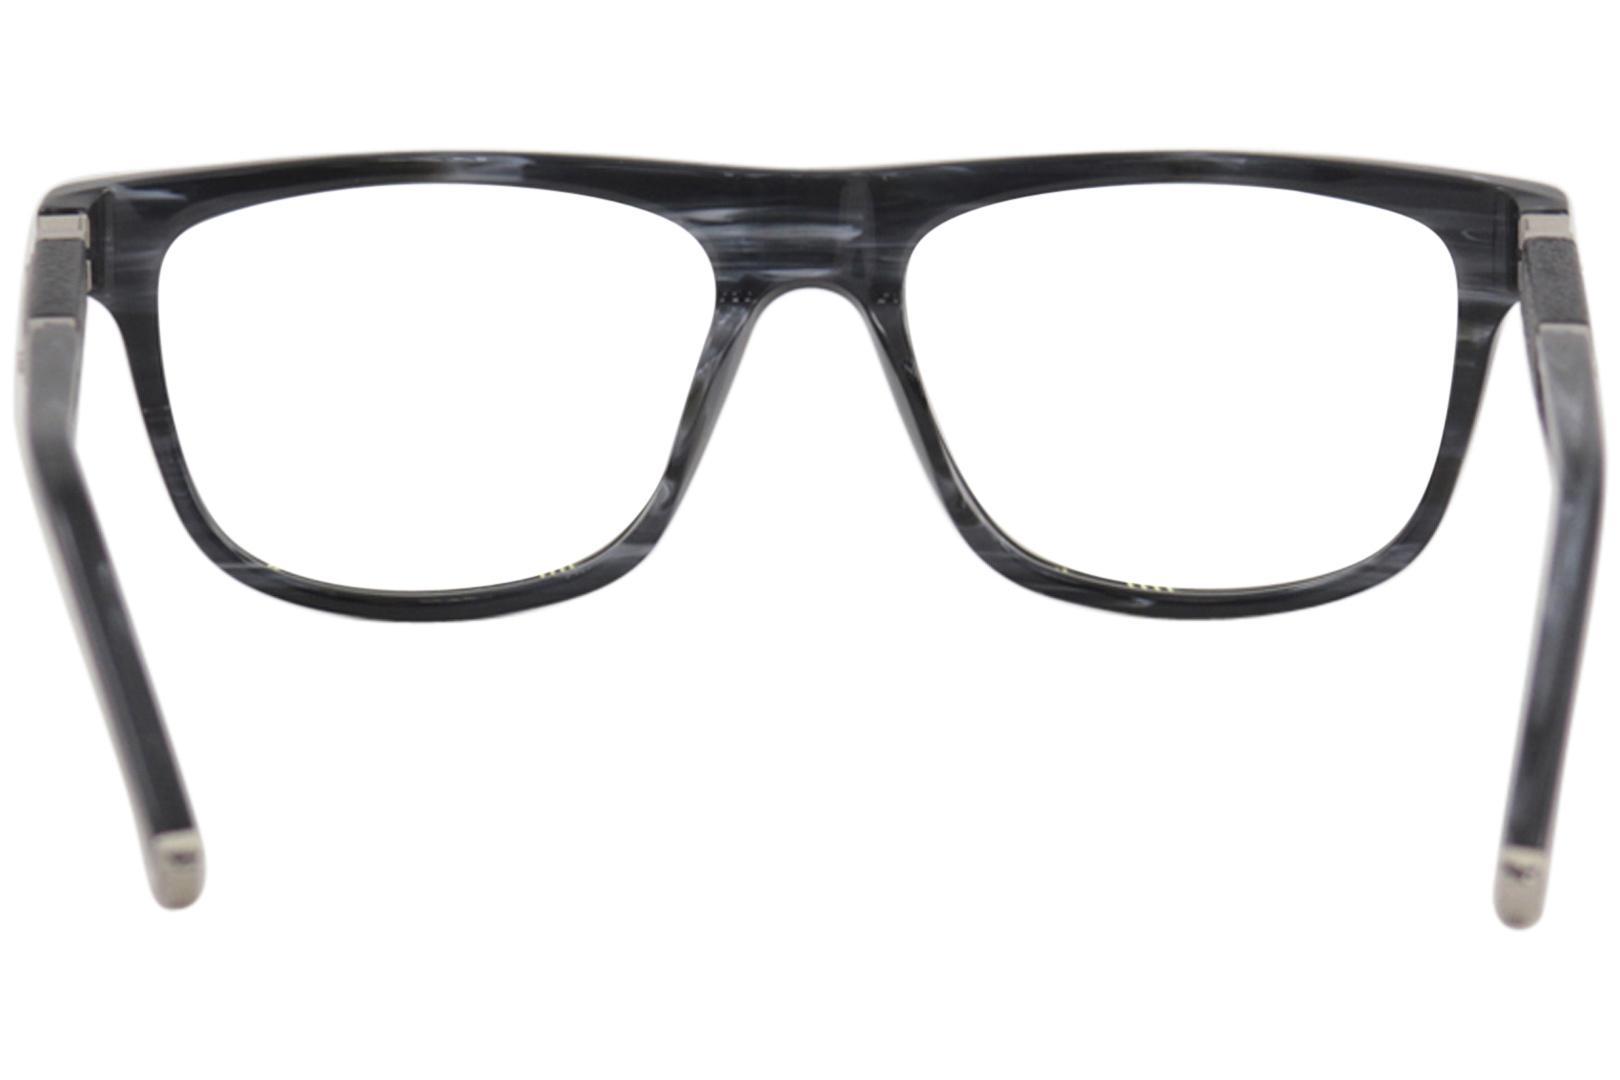 ee95b50ceb Zilli Men s Eyeglasses ZI60003 ZI 60003 Full Rim Optical Frame